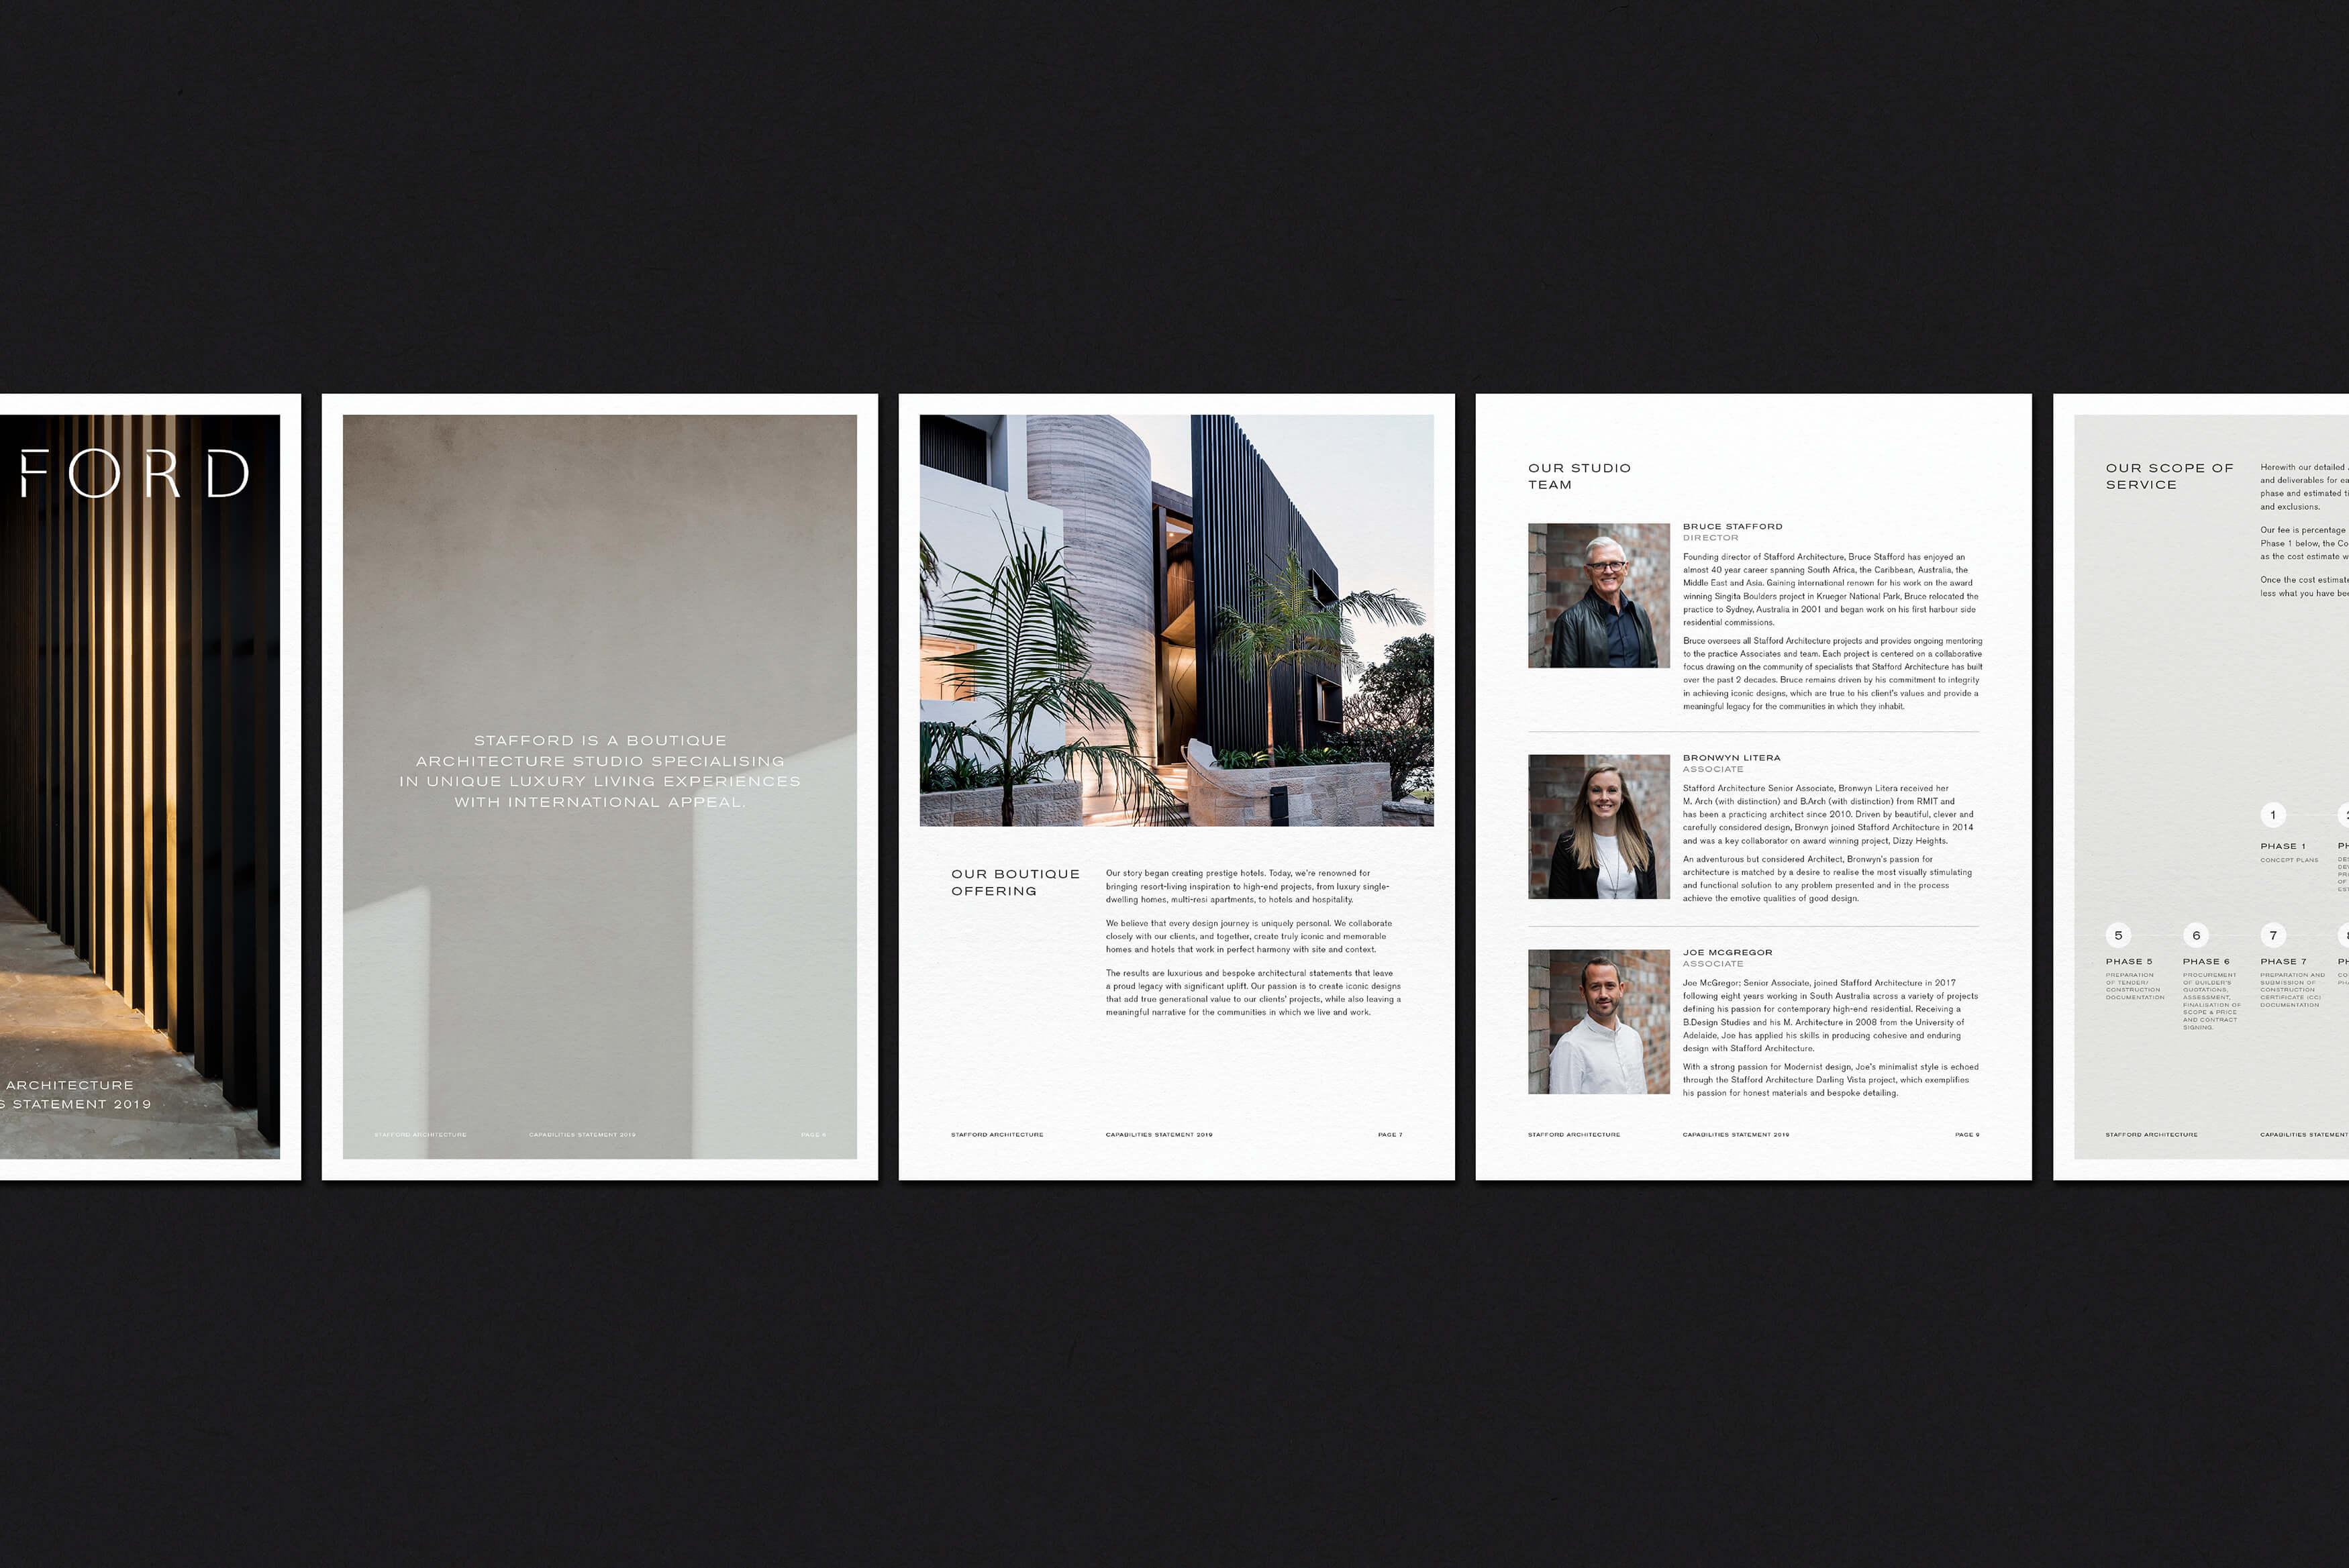 Stafford Architecture - Capabilities Statement design